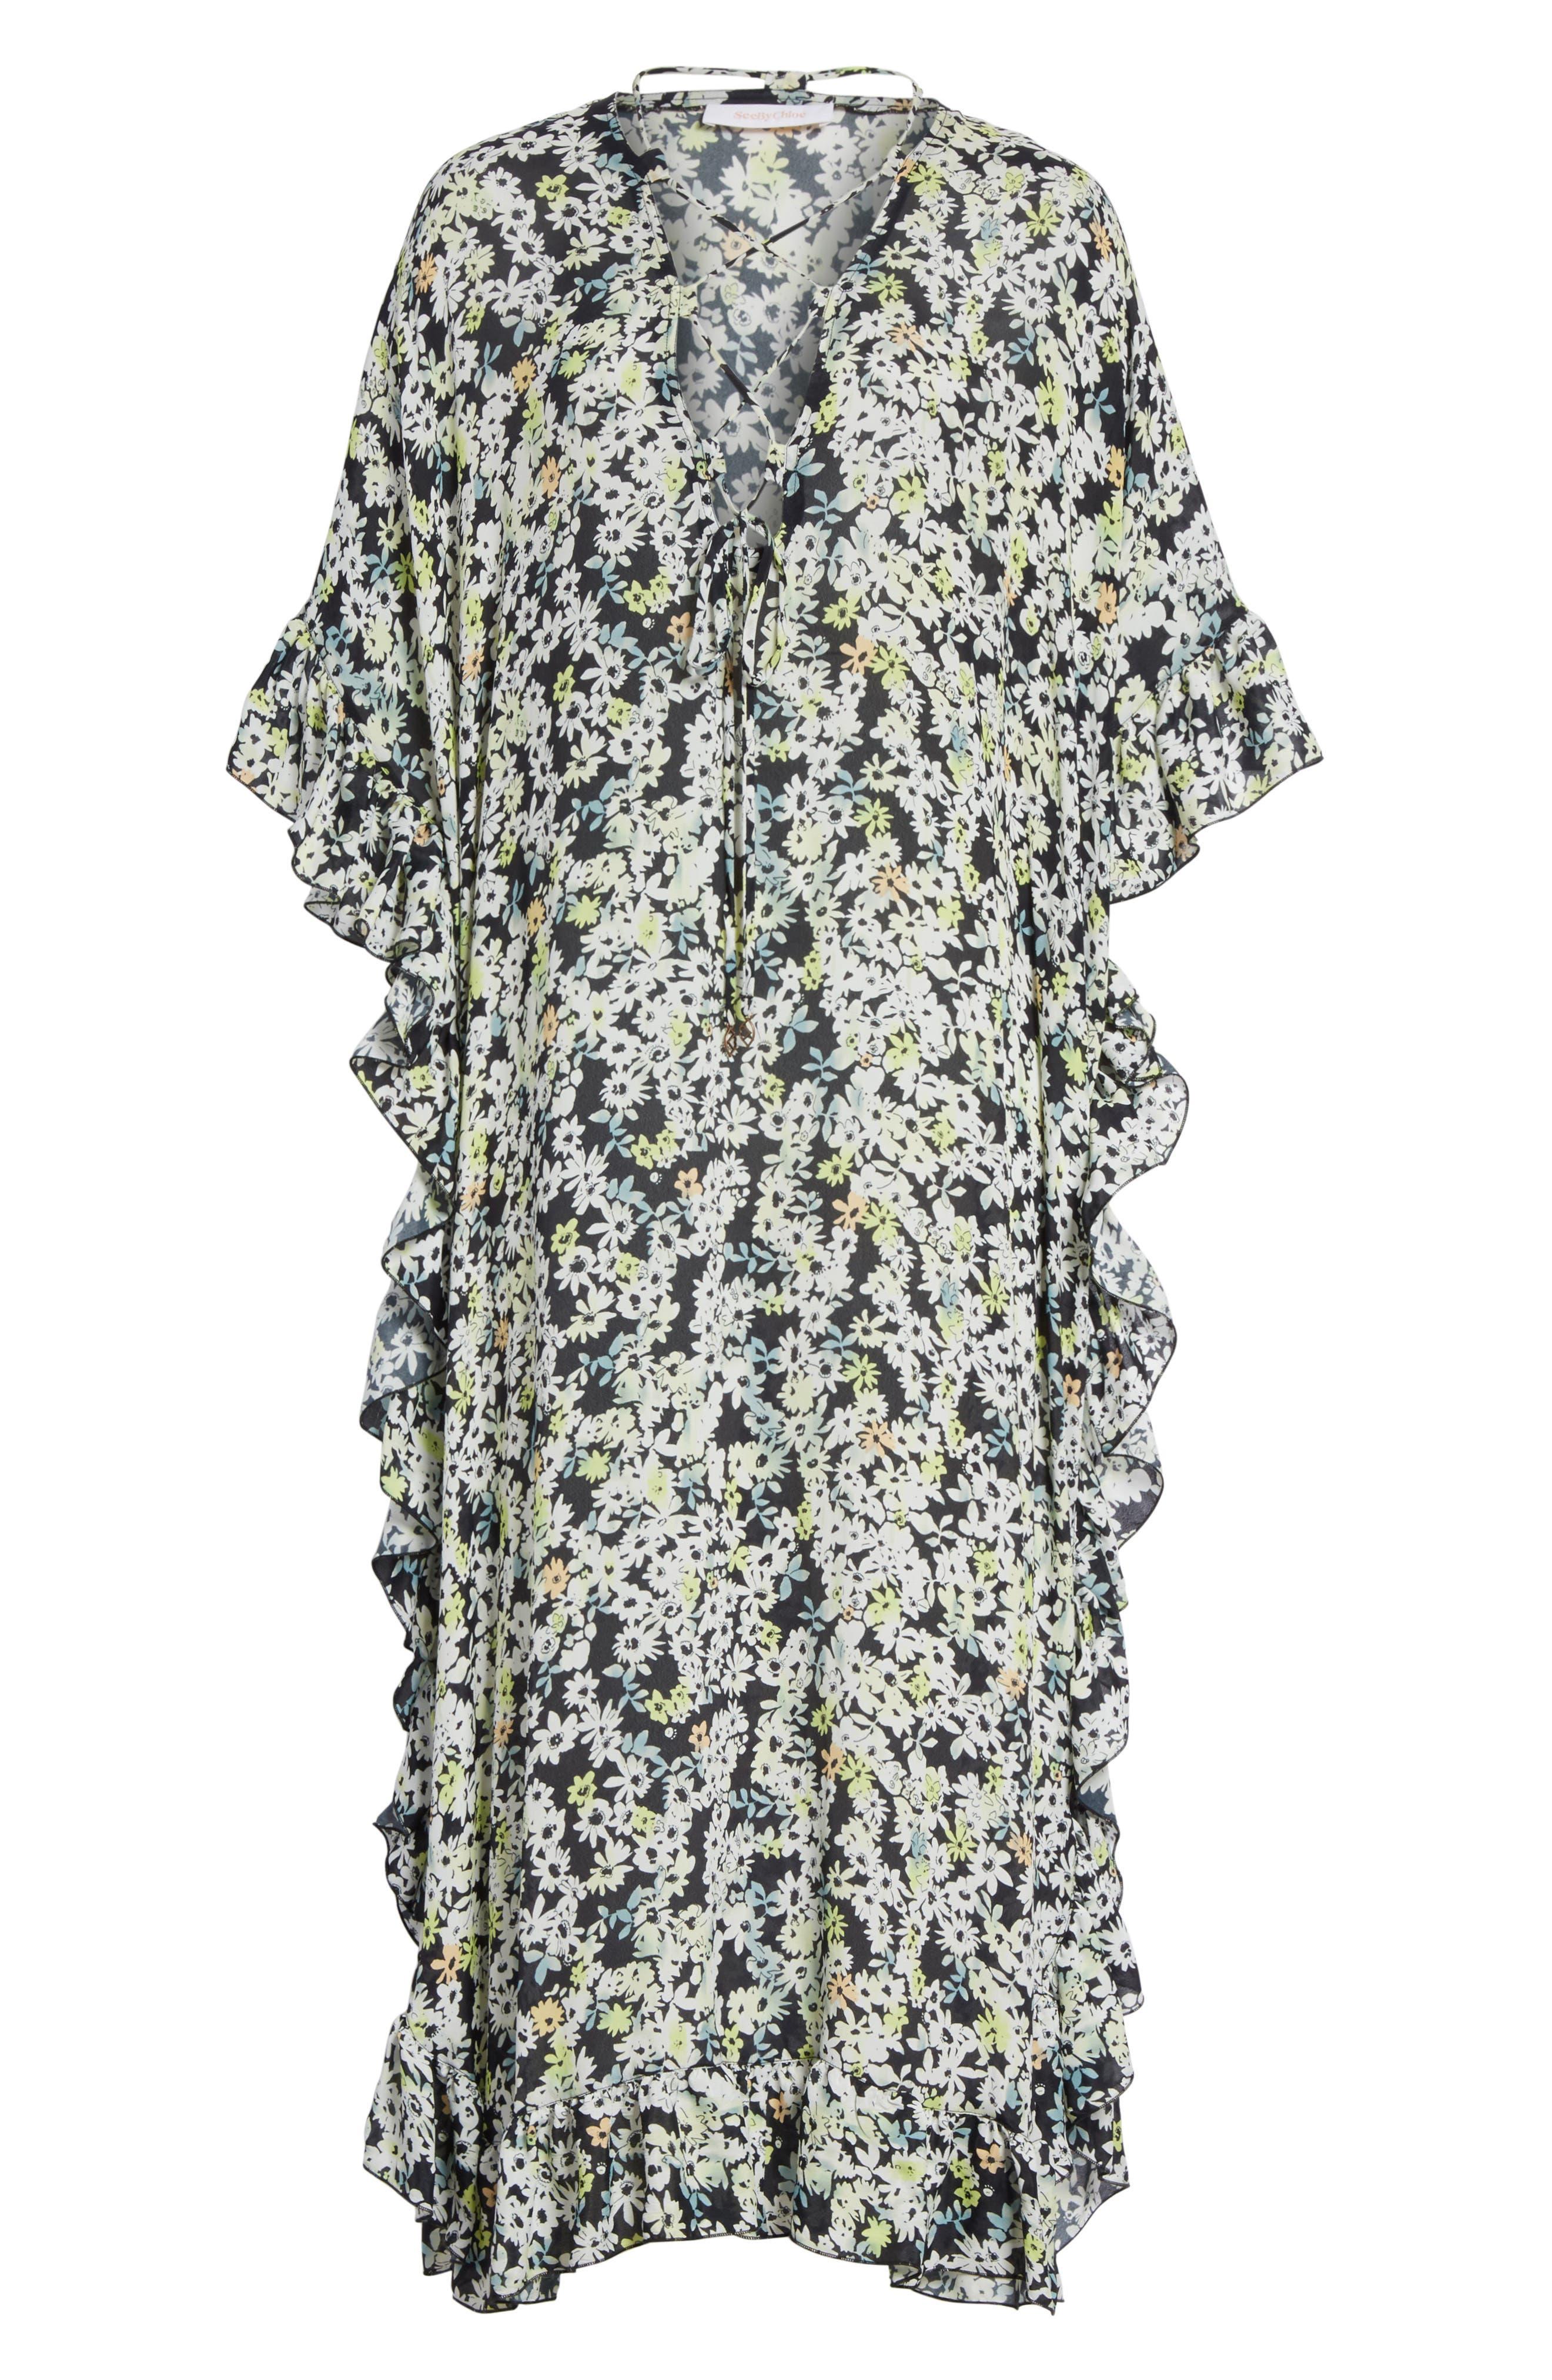 SEE BY CHLOÉ,                             Floral Print Flutter Edge Dress,                             Alternate thumbnail 6, color,                             021